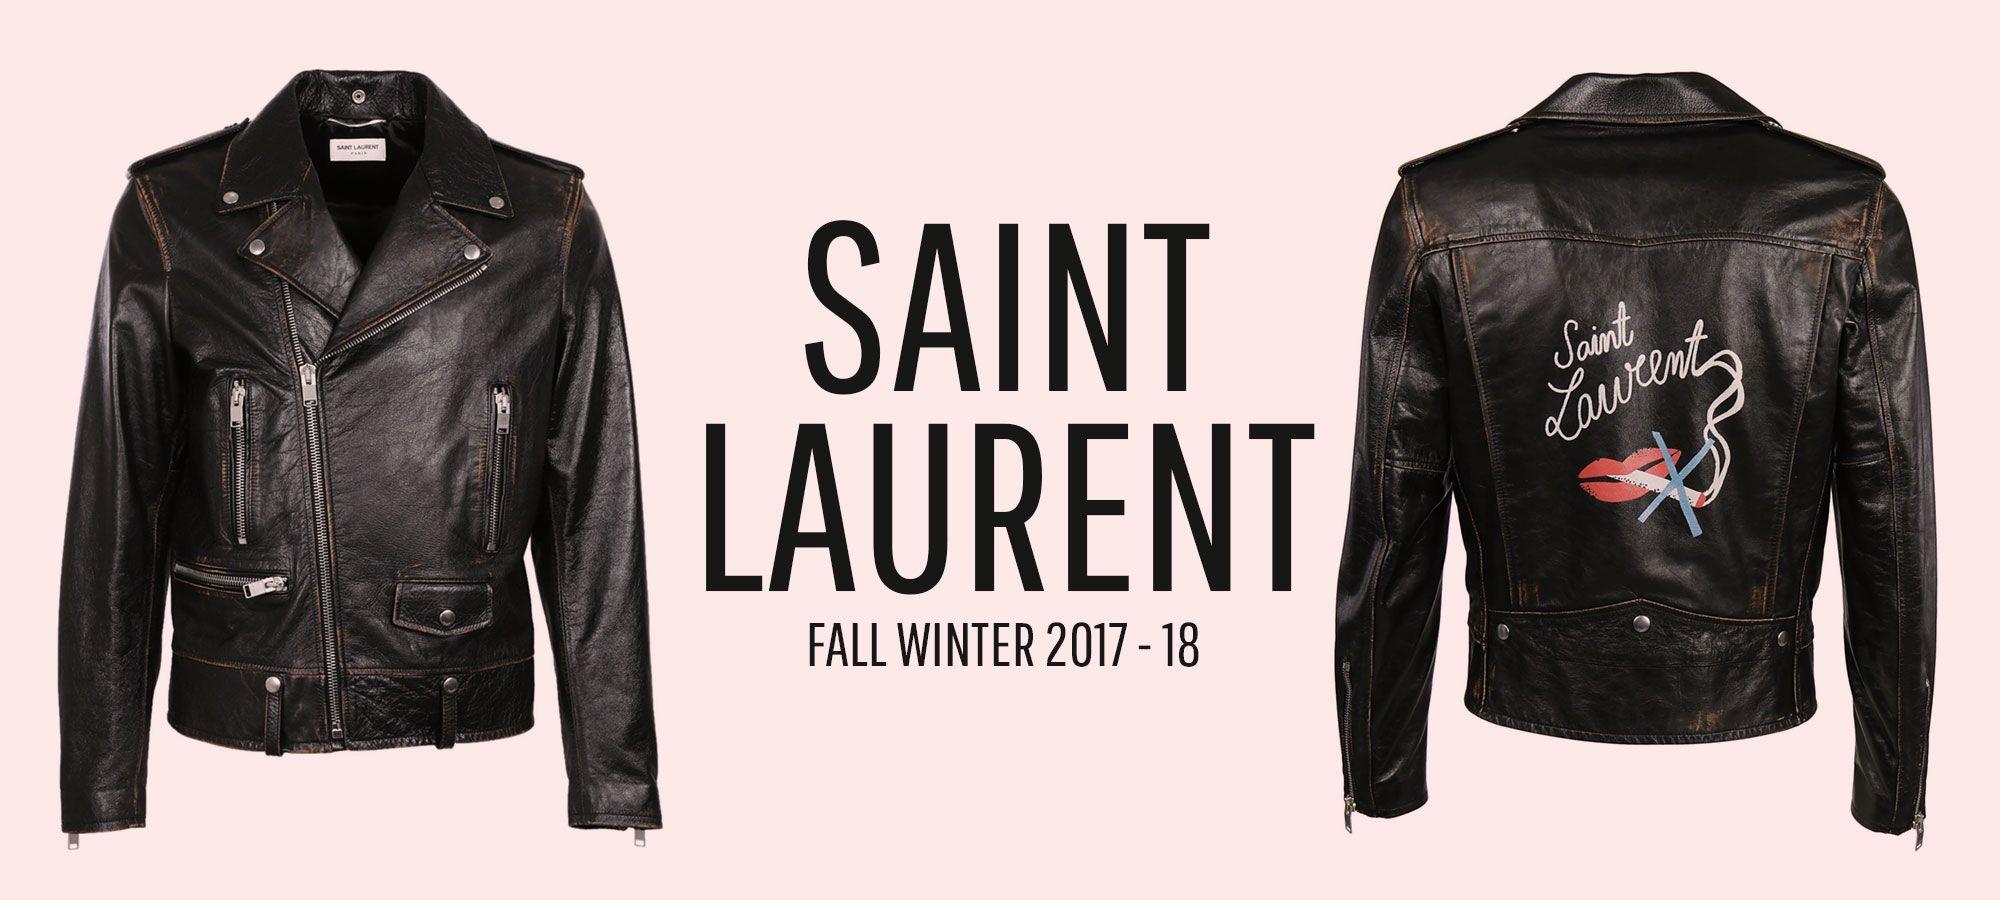 Saint Laurent Men - Fall Winter 2017